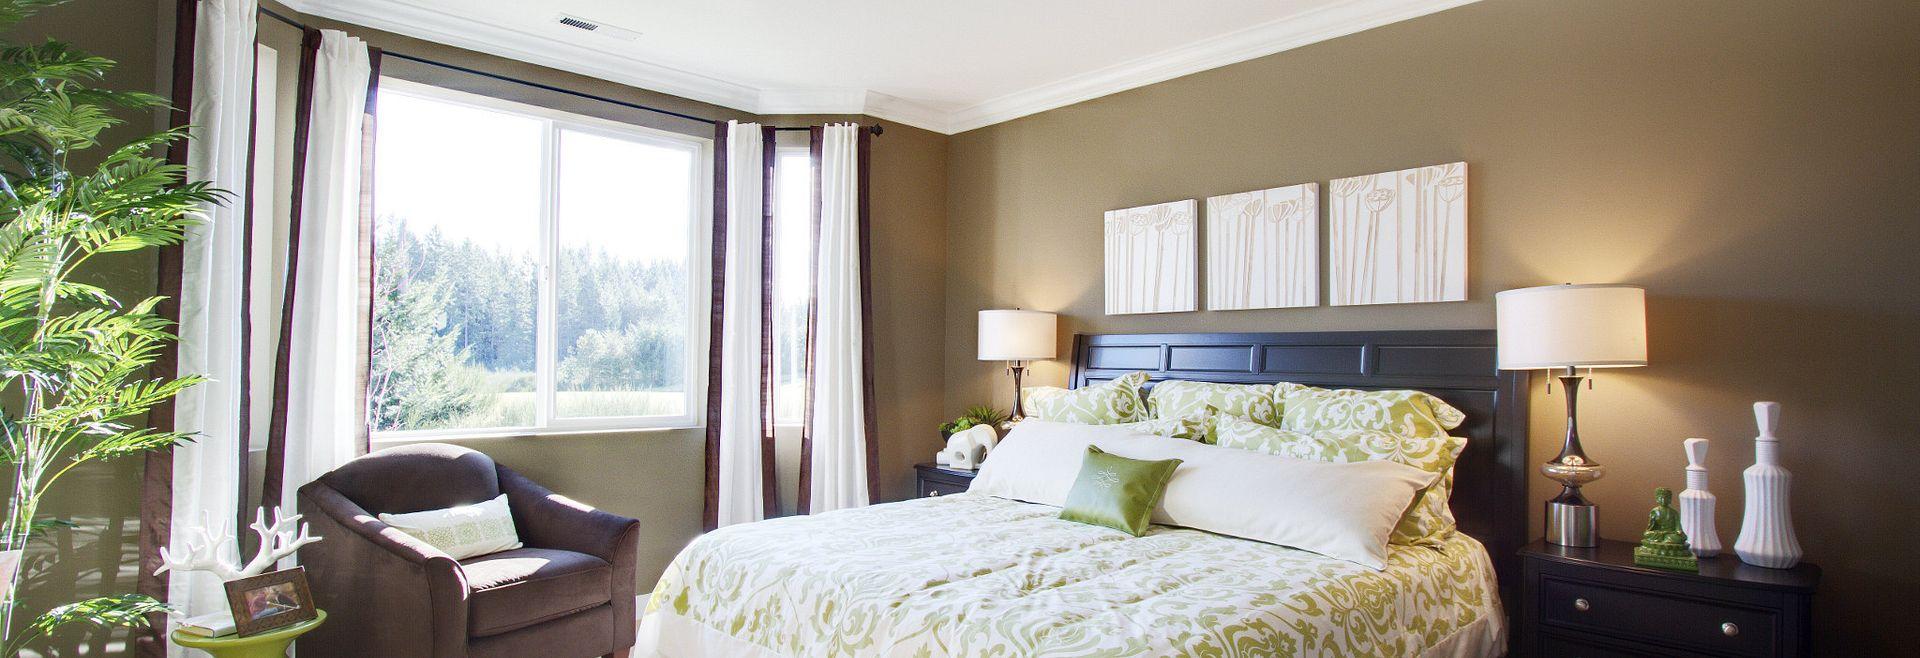 Trilogy at Tehaleh Pebble Beach Master Bedroom